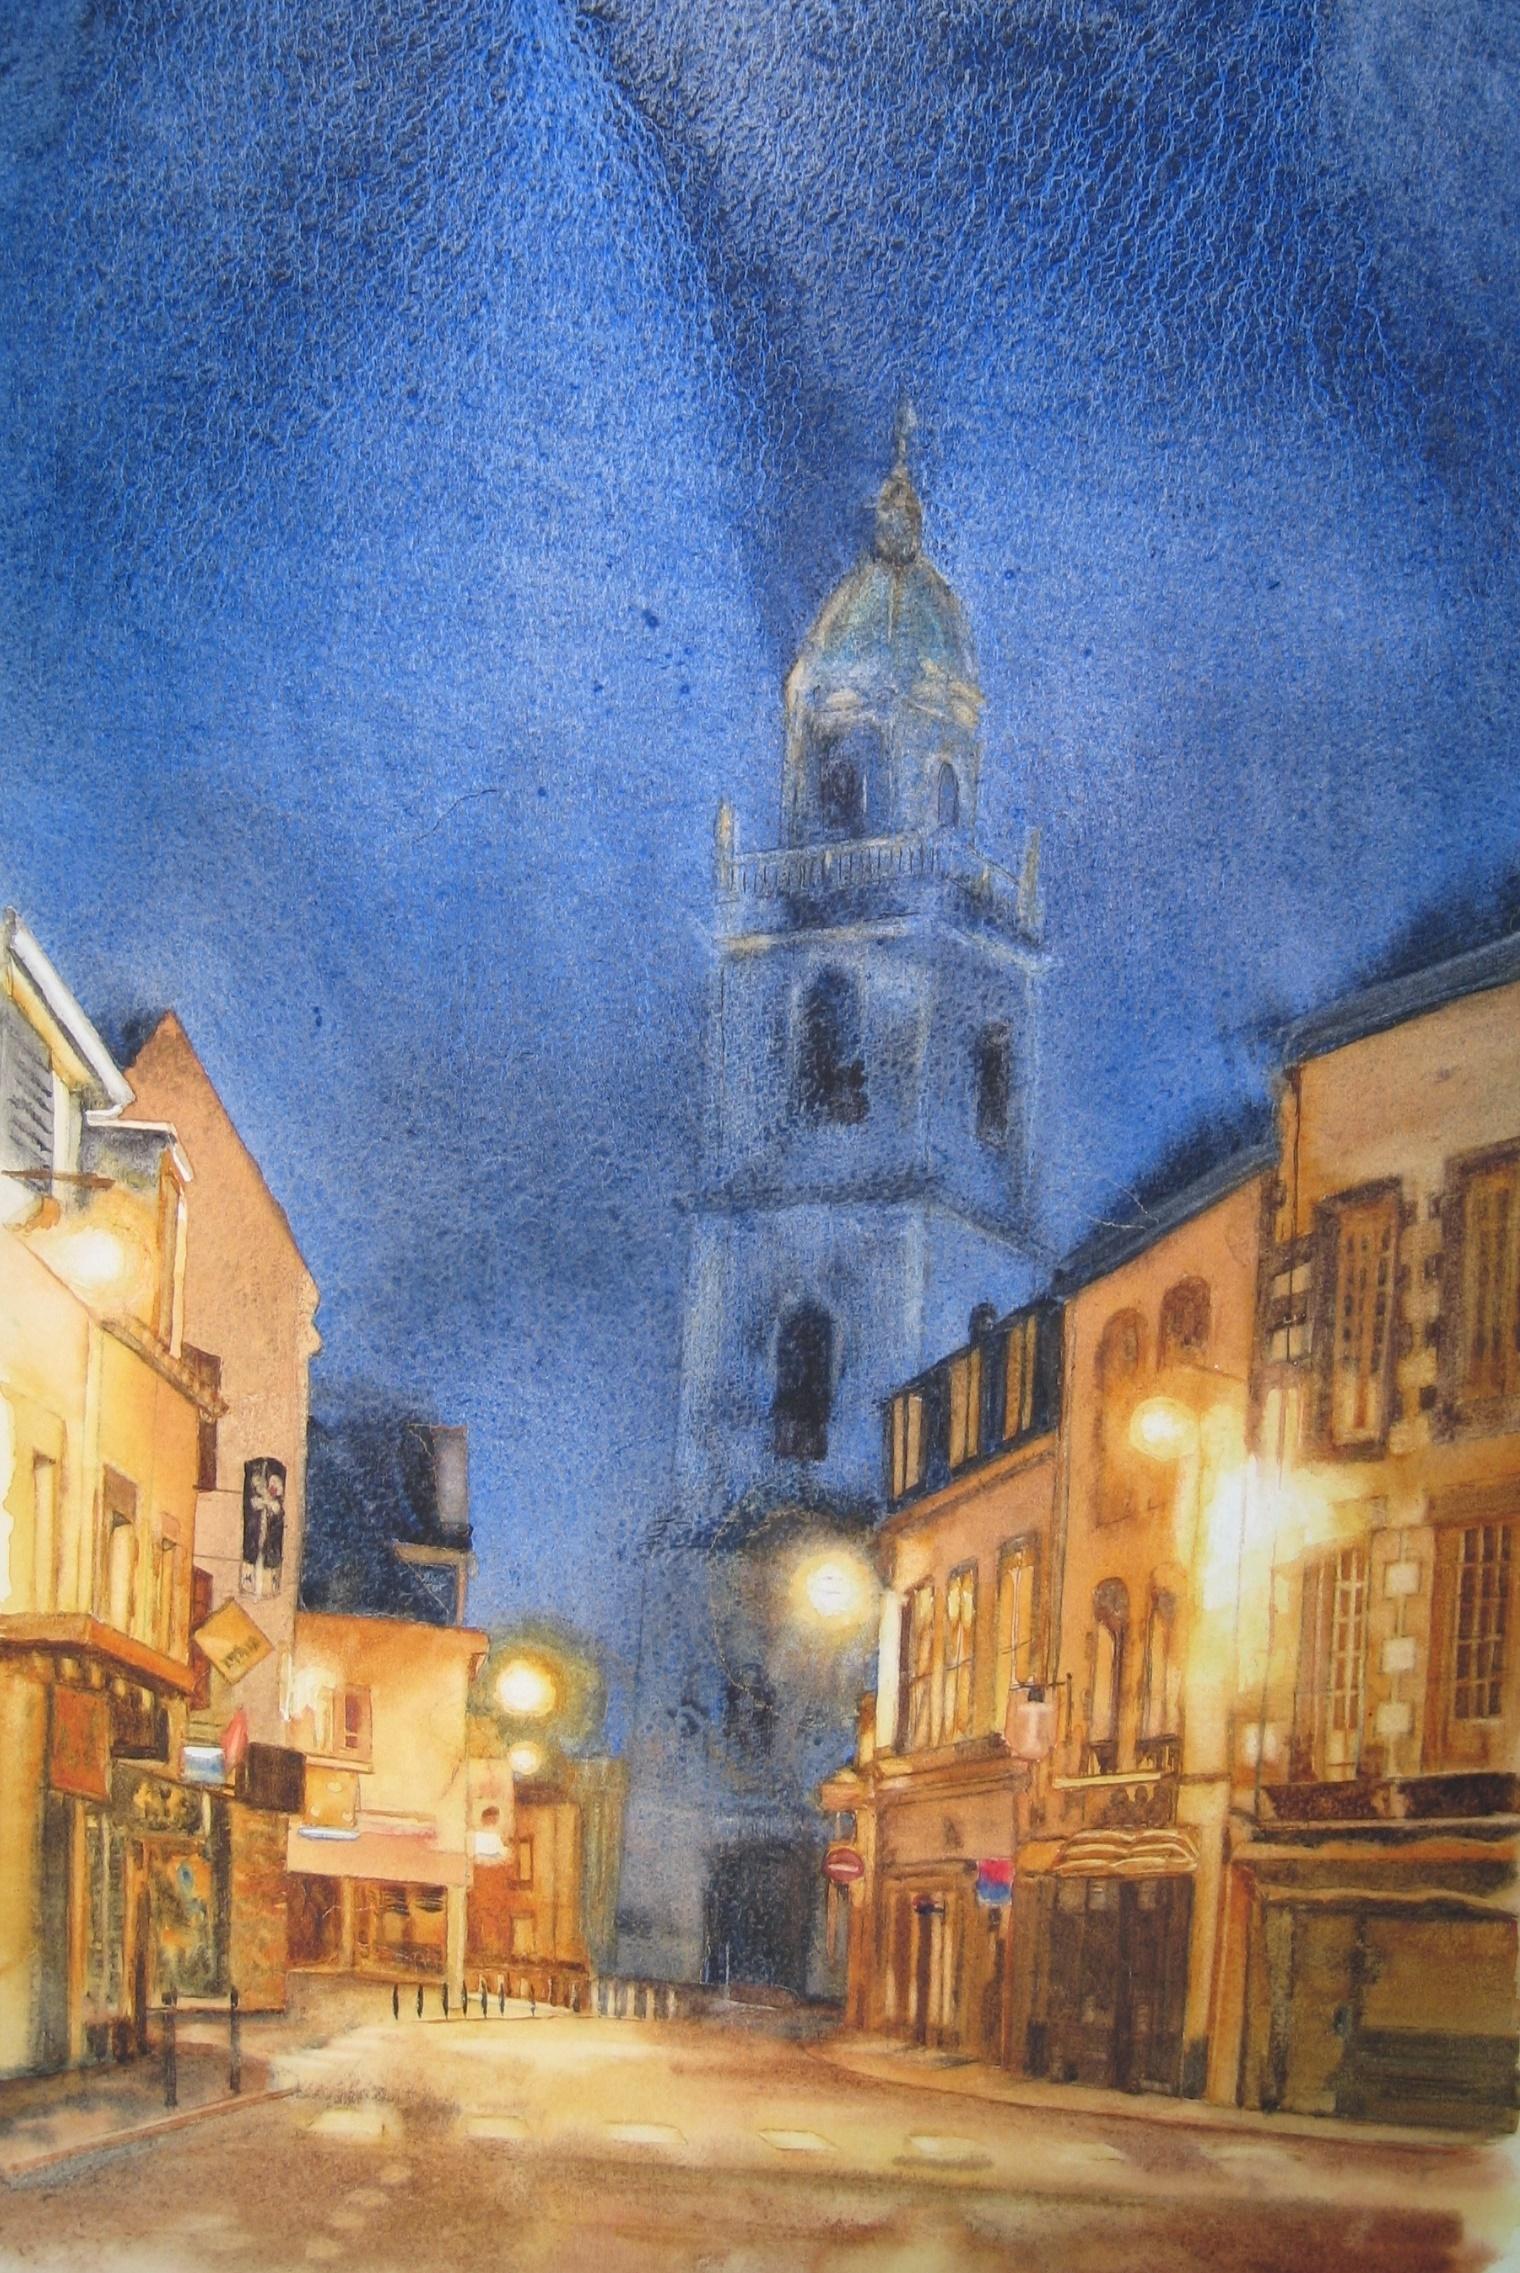 St. Gildas à Auray